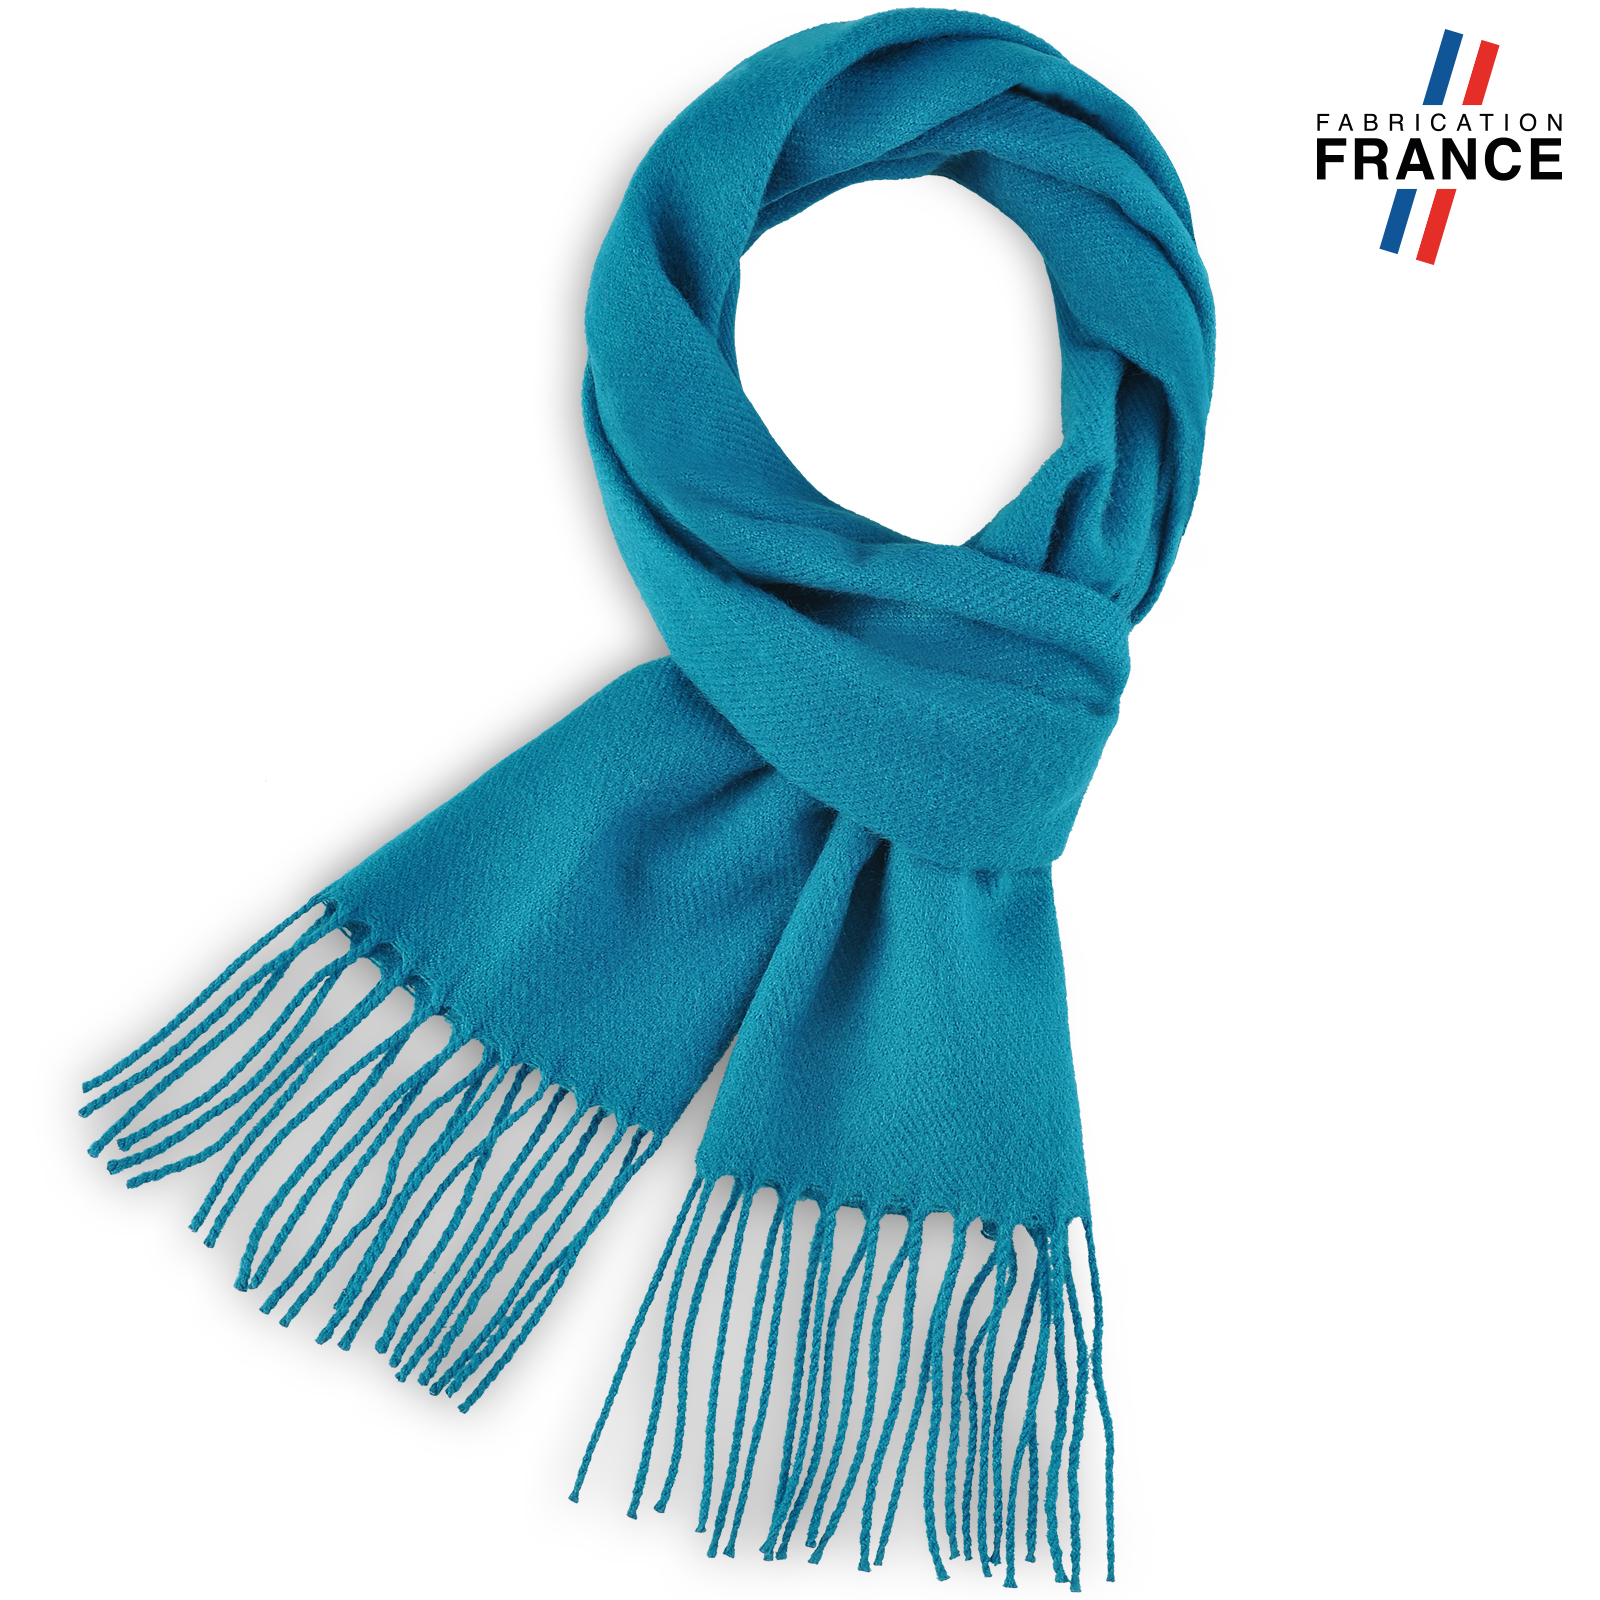 AT-03235-F16-echarpe-a-franges-bleu-paon-fabrication-francaise